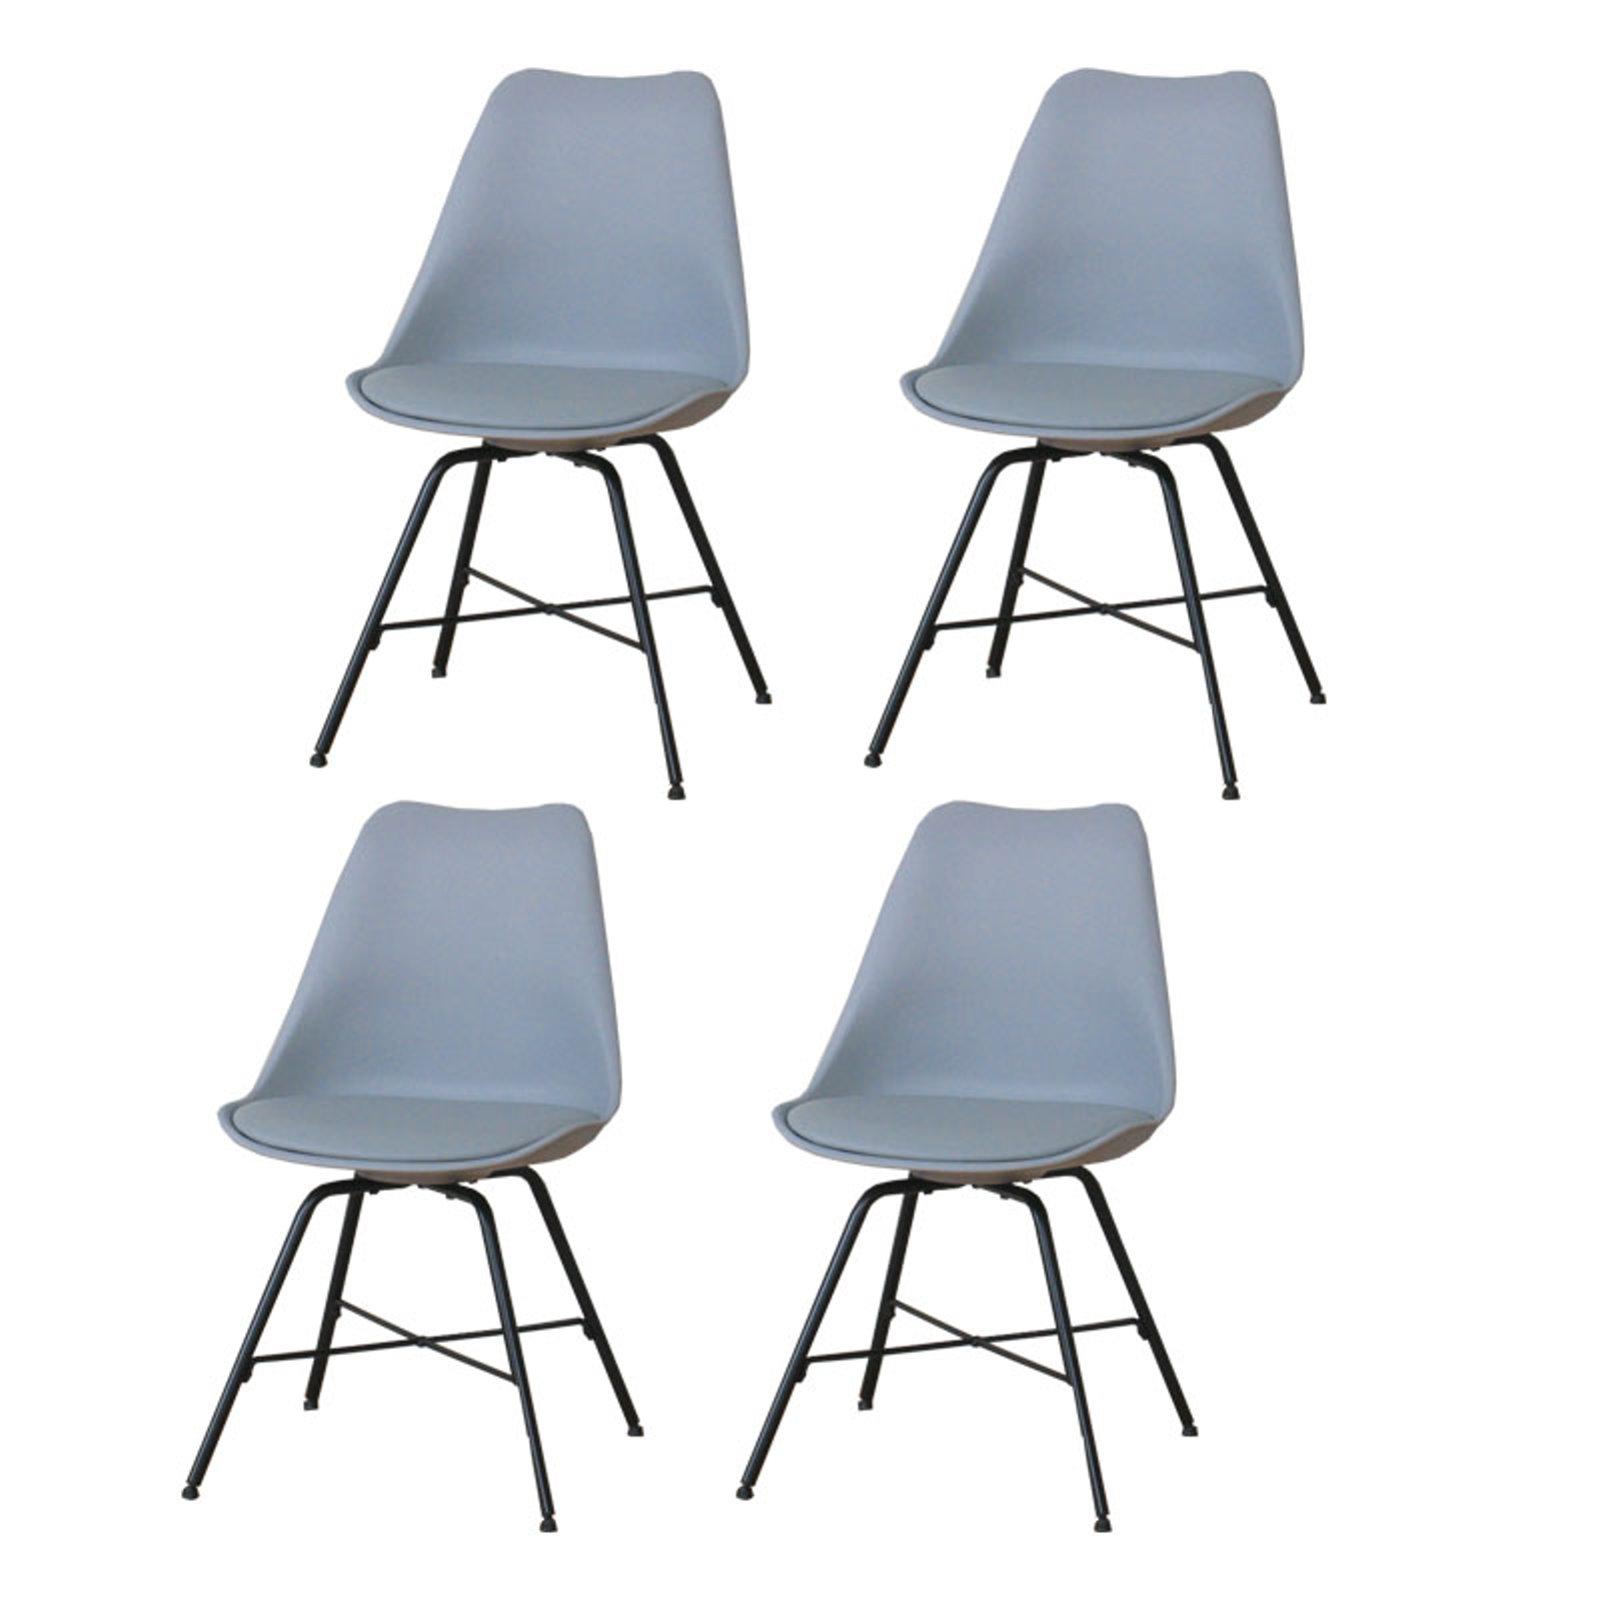 4 x chaises de salle manger niko r tro chaise si ge for Chaise de salle a manger trackid sp 006